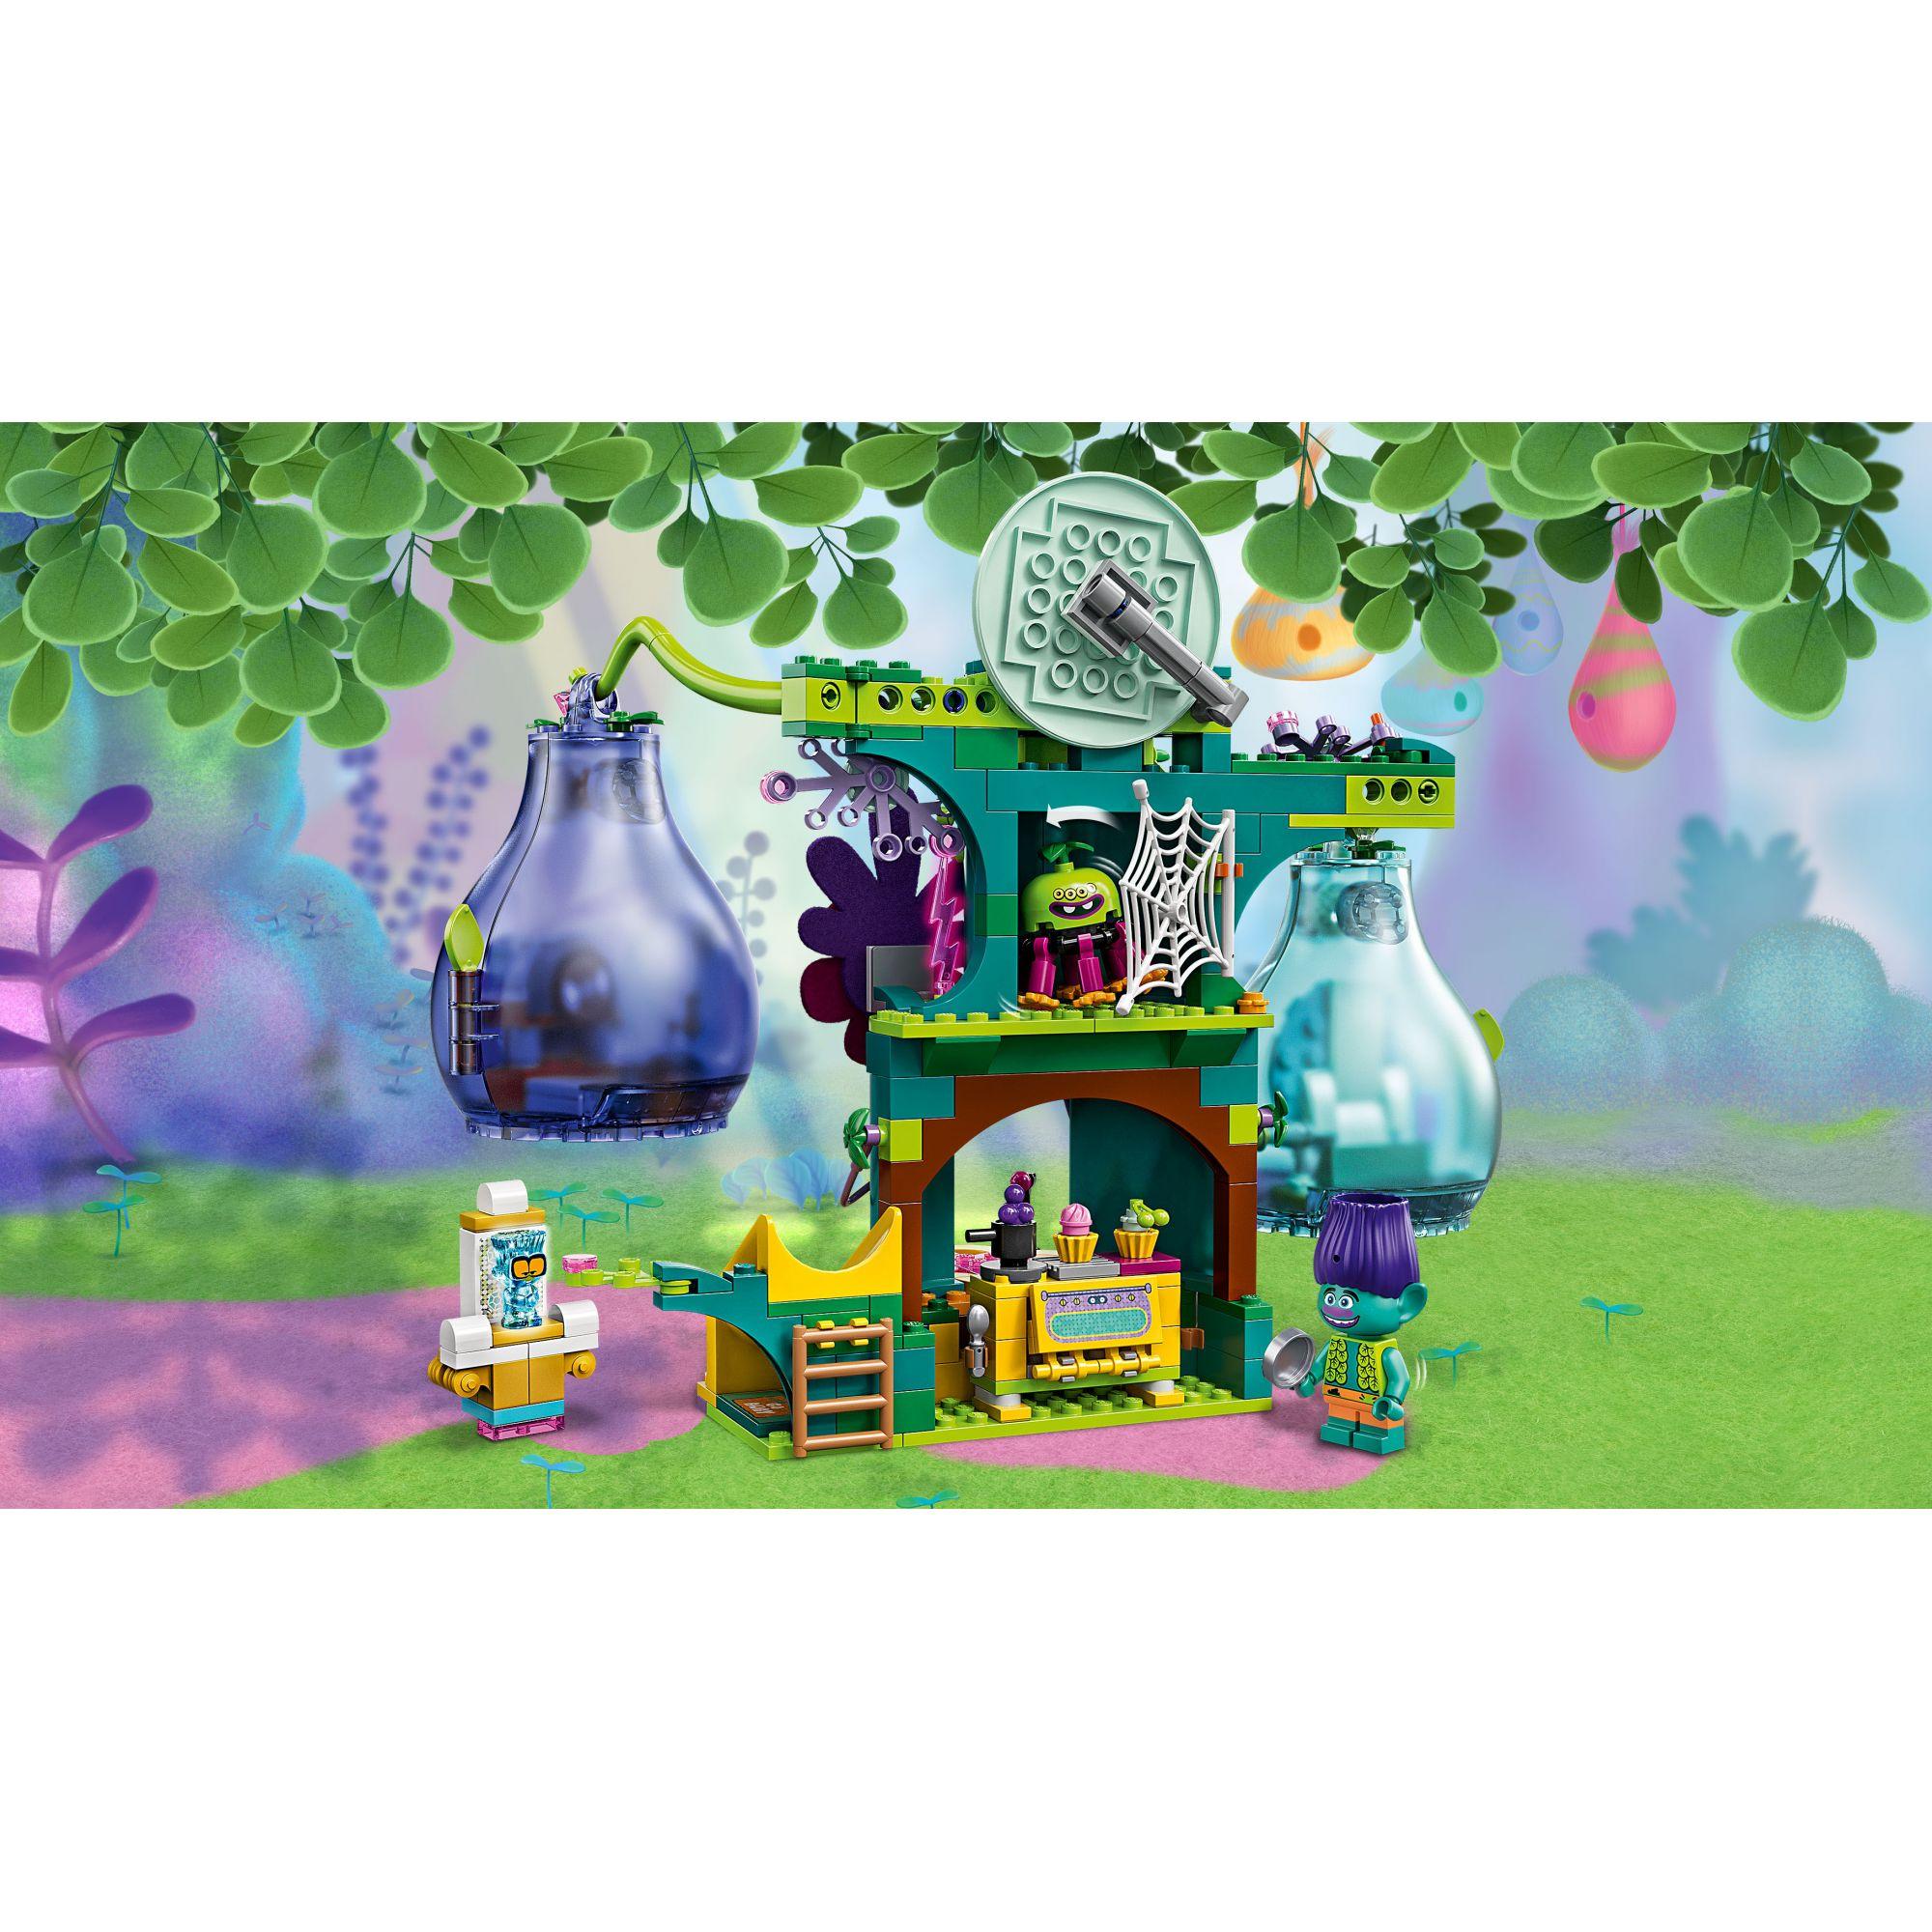 LEGO Trolls Festa al Villaggio Pop - 41255